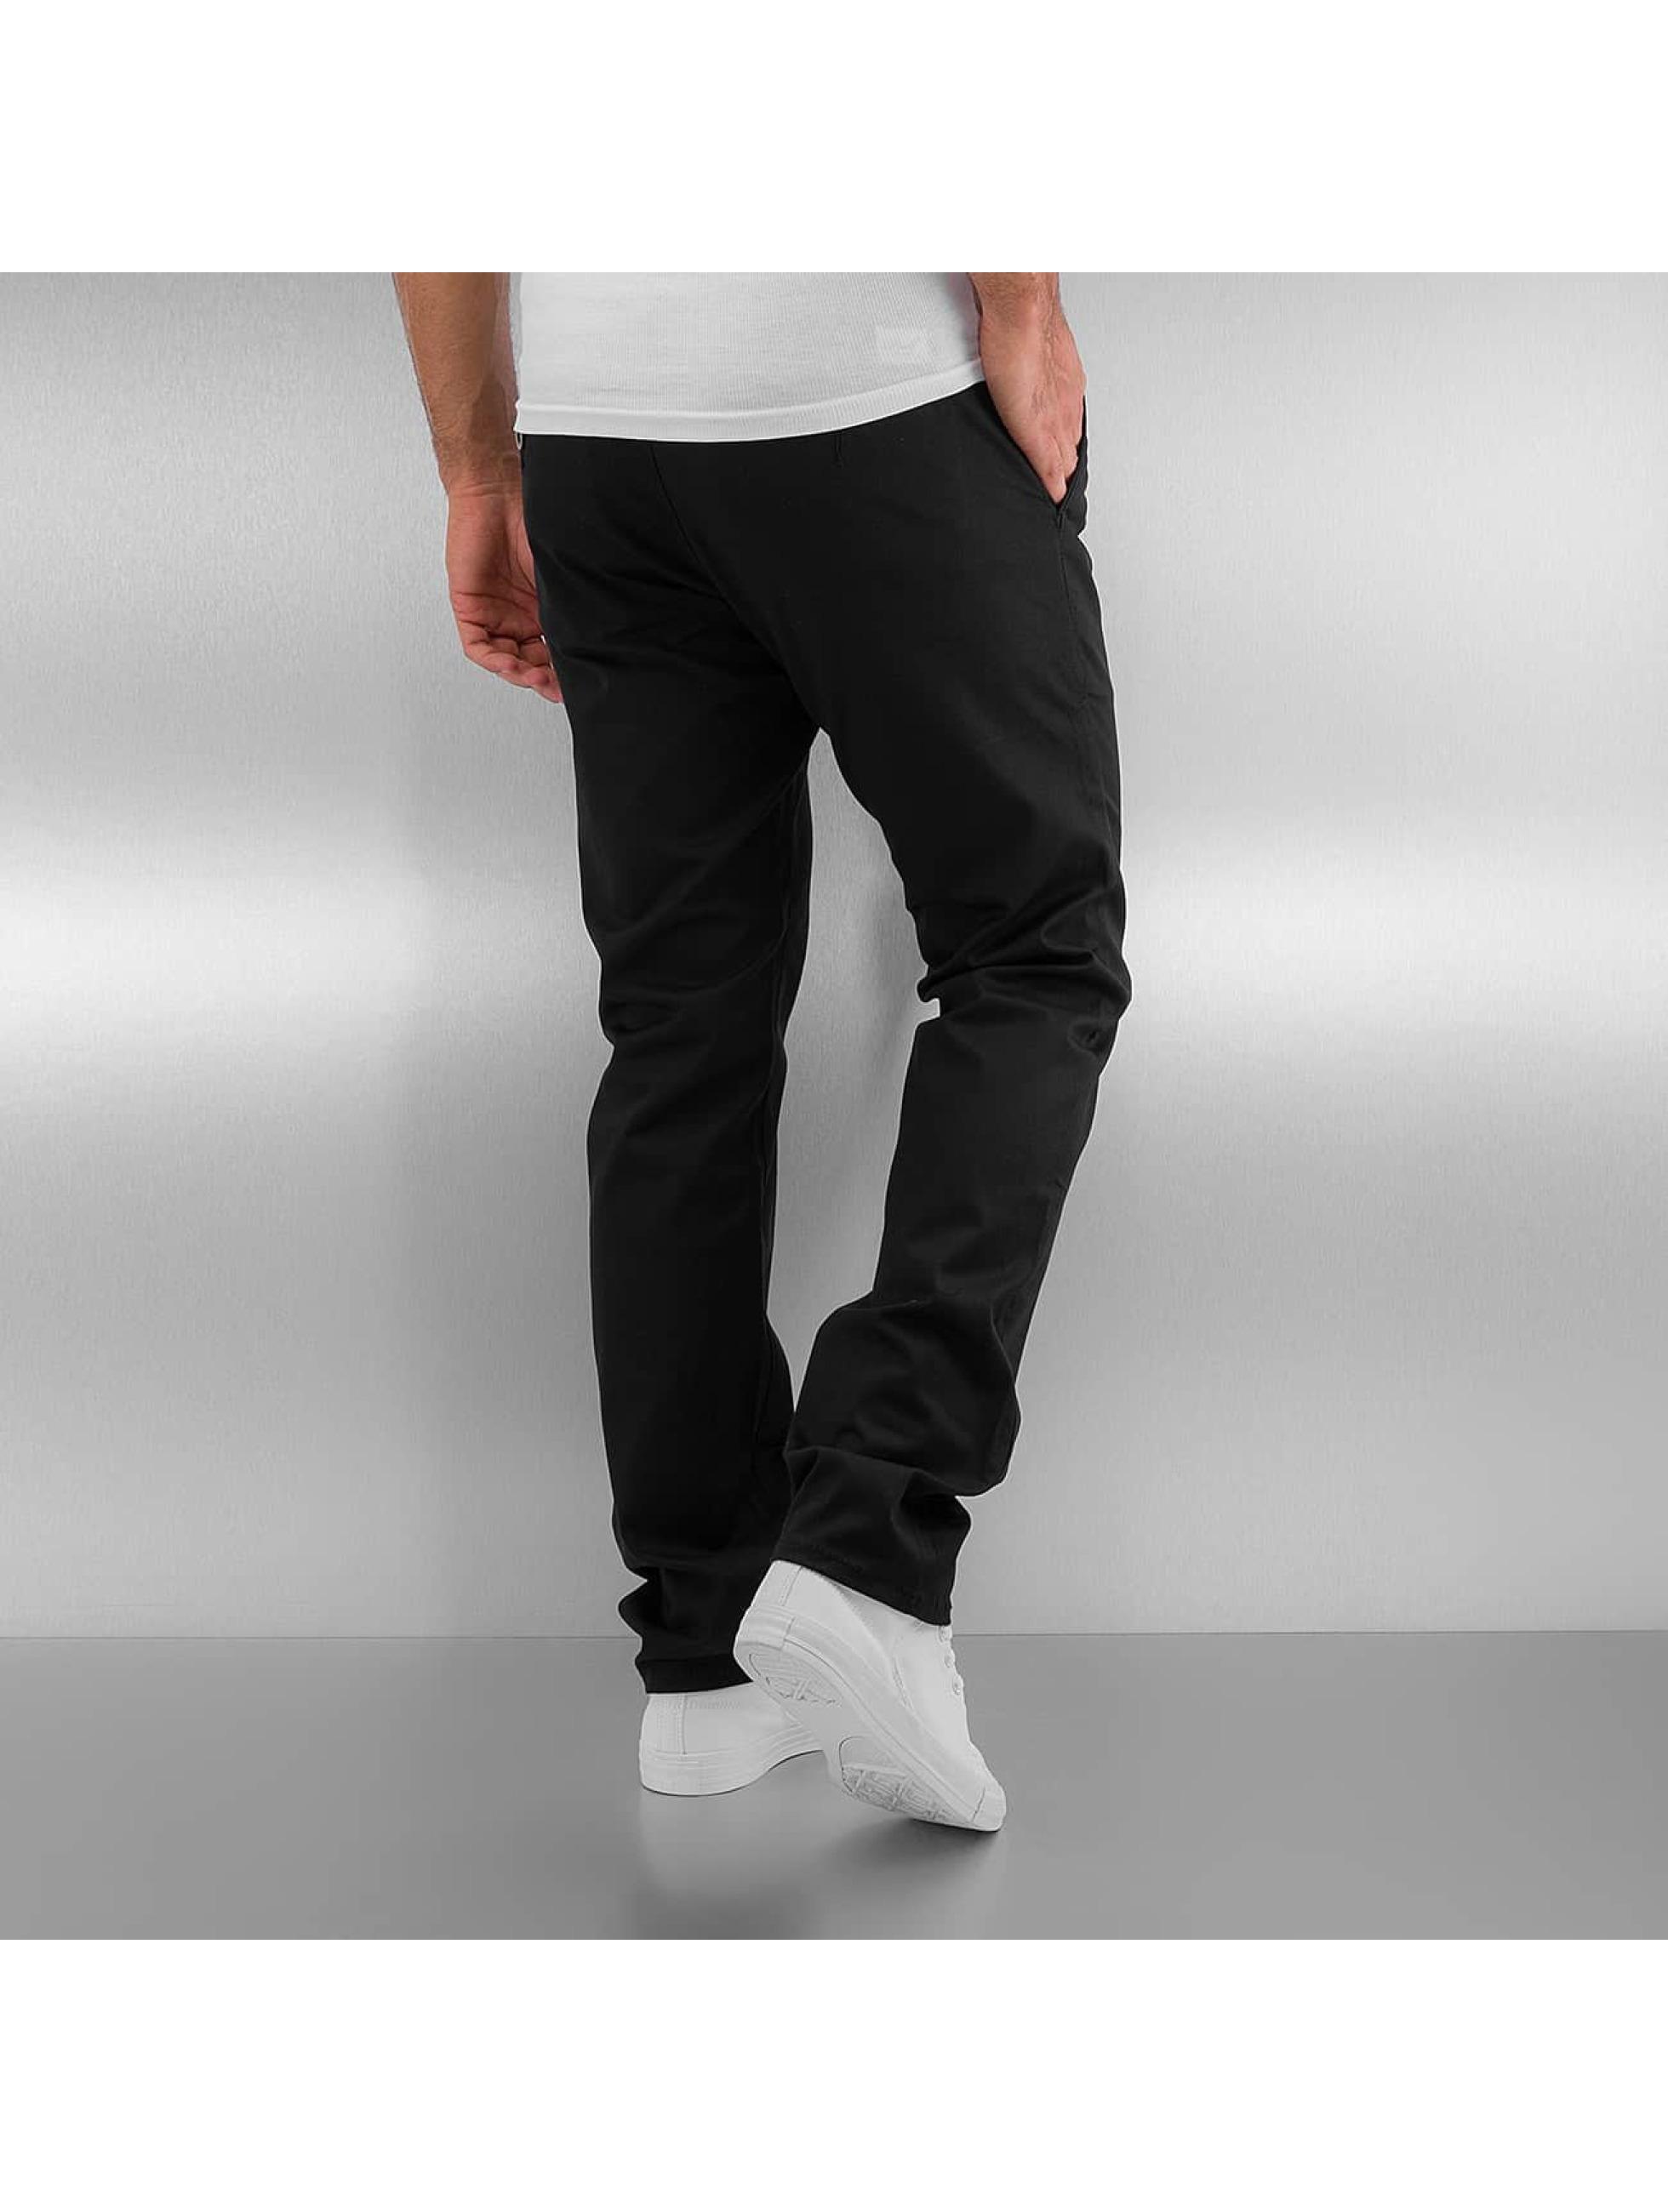 Reell Jeans Чинос Straight Flex черный